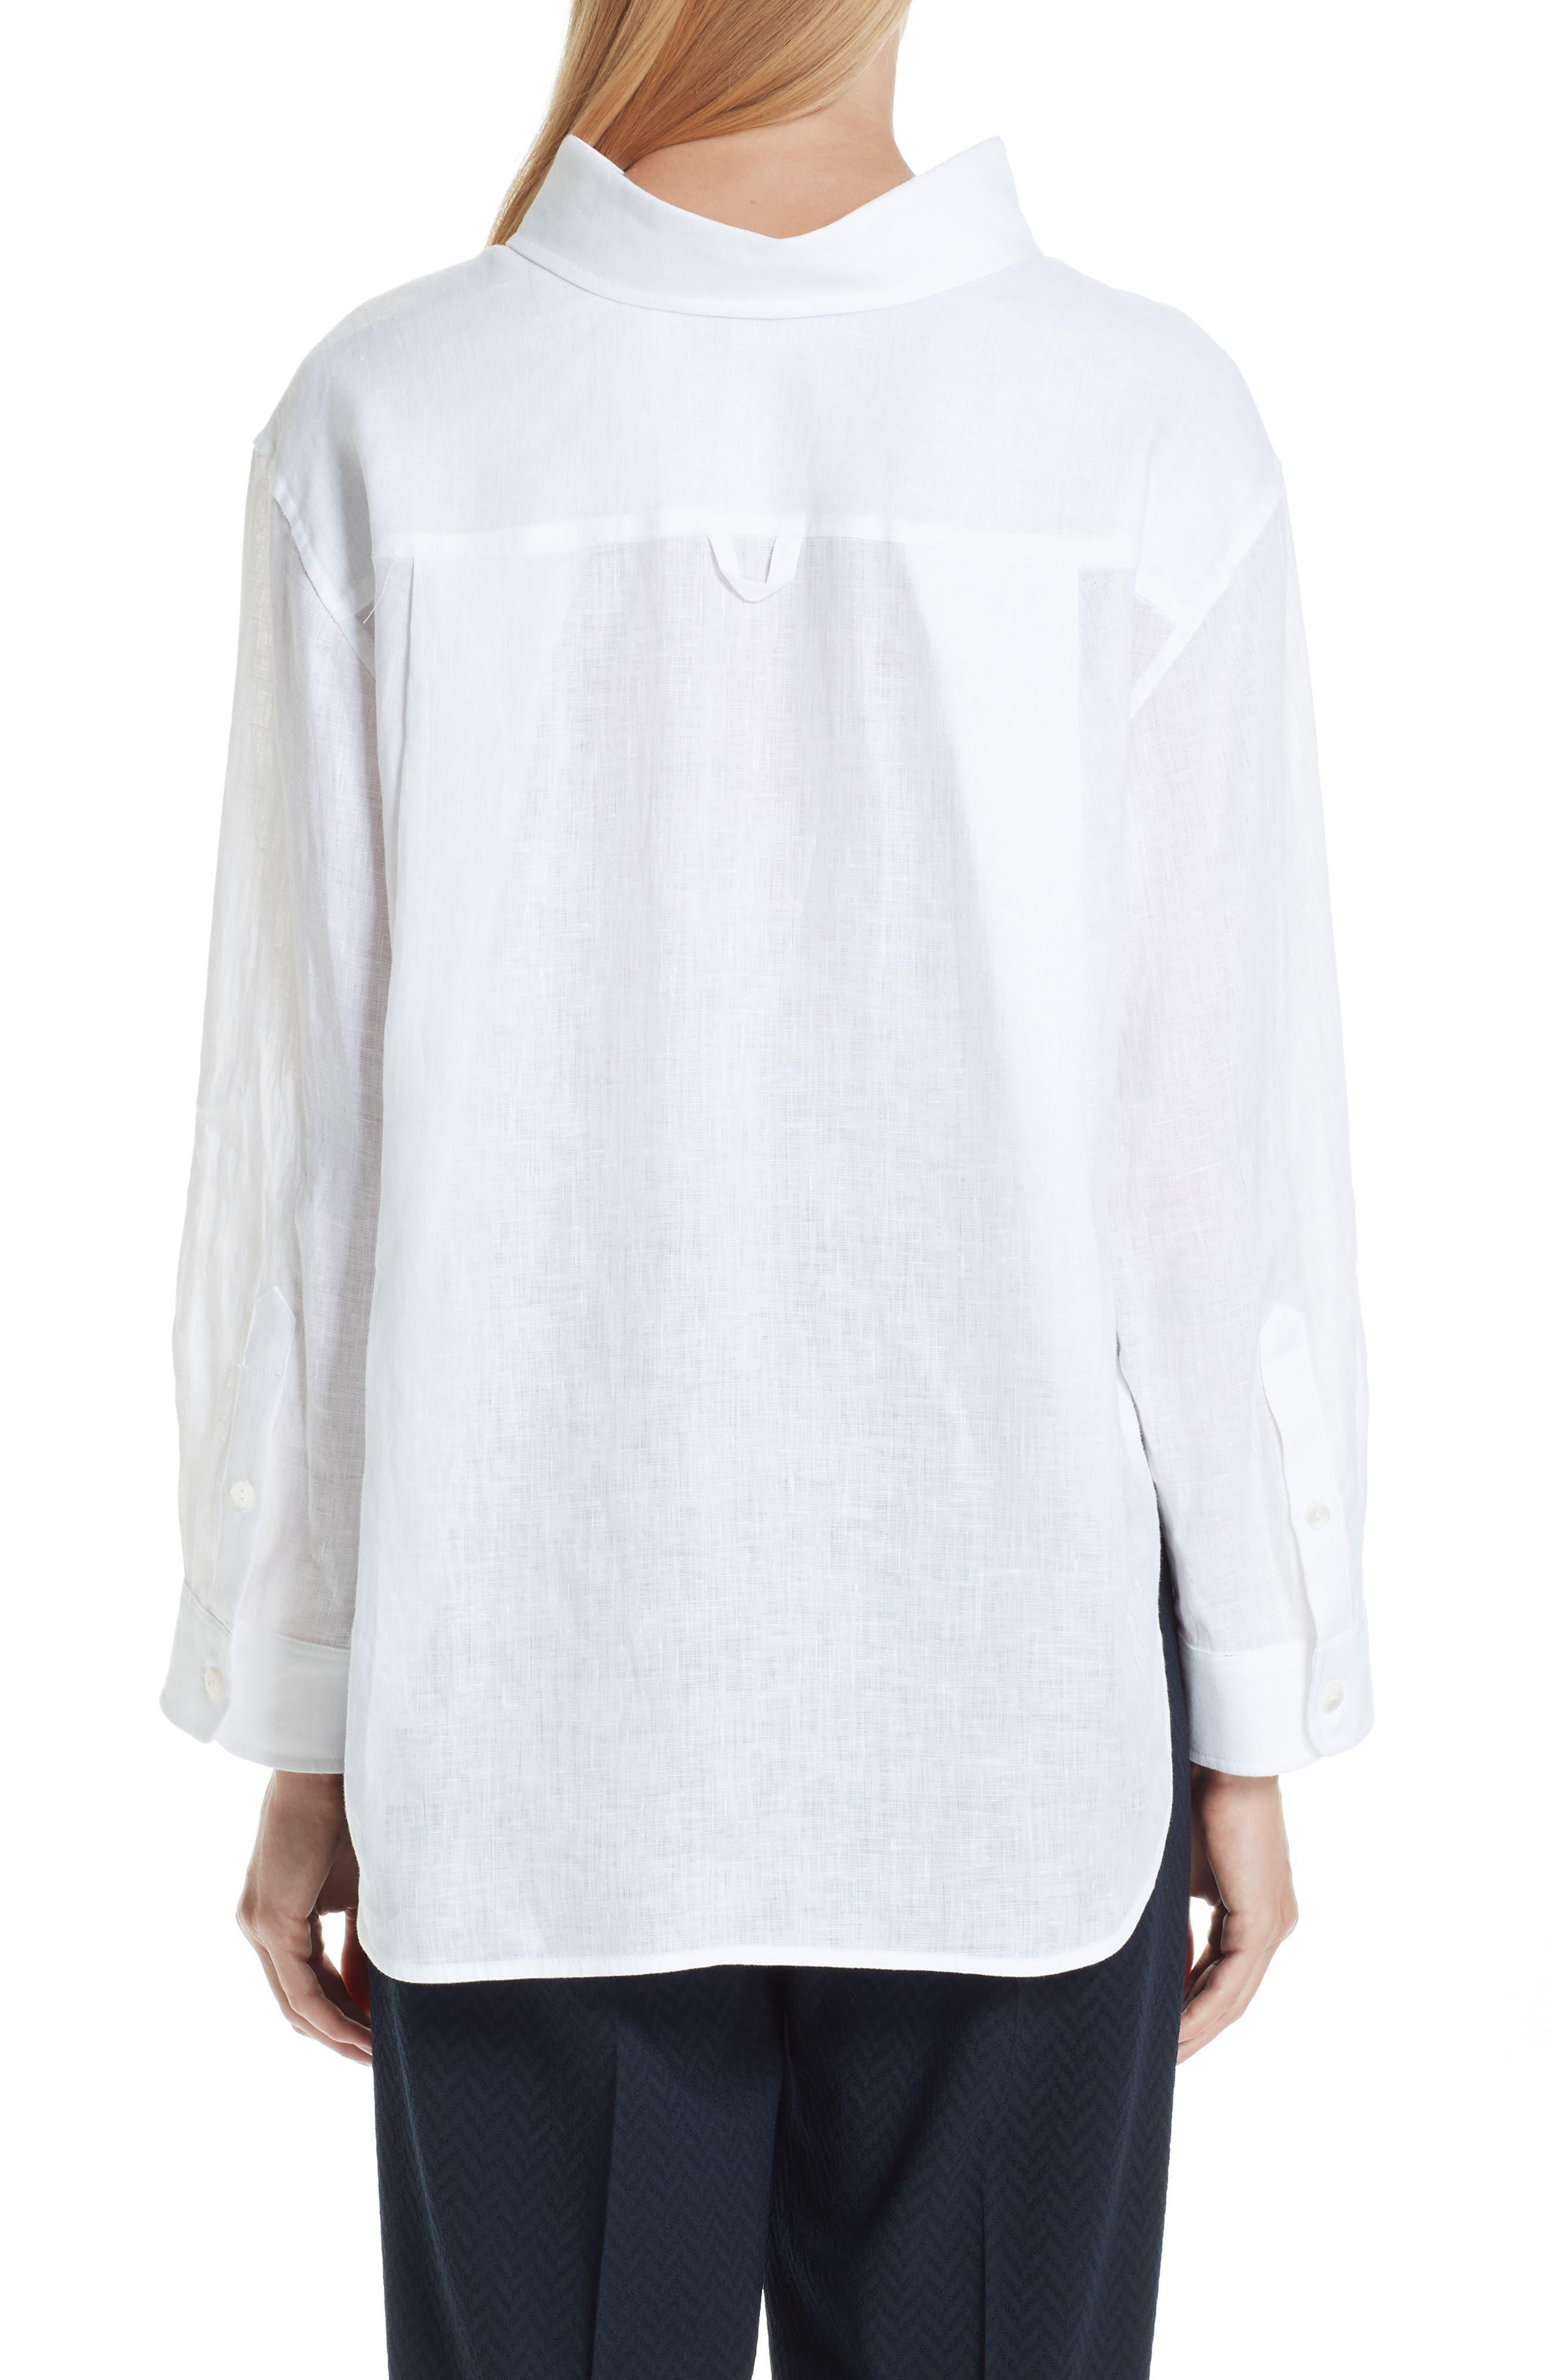 EMPORIO ARMANI,                             Long Sleeve Linen Blouse,                             Alternate thumbnail 2, color,                             BIANCO